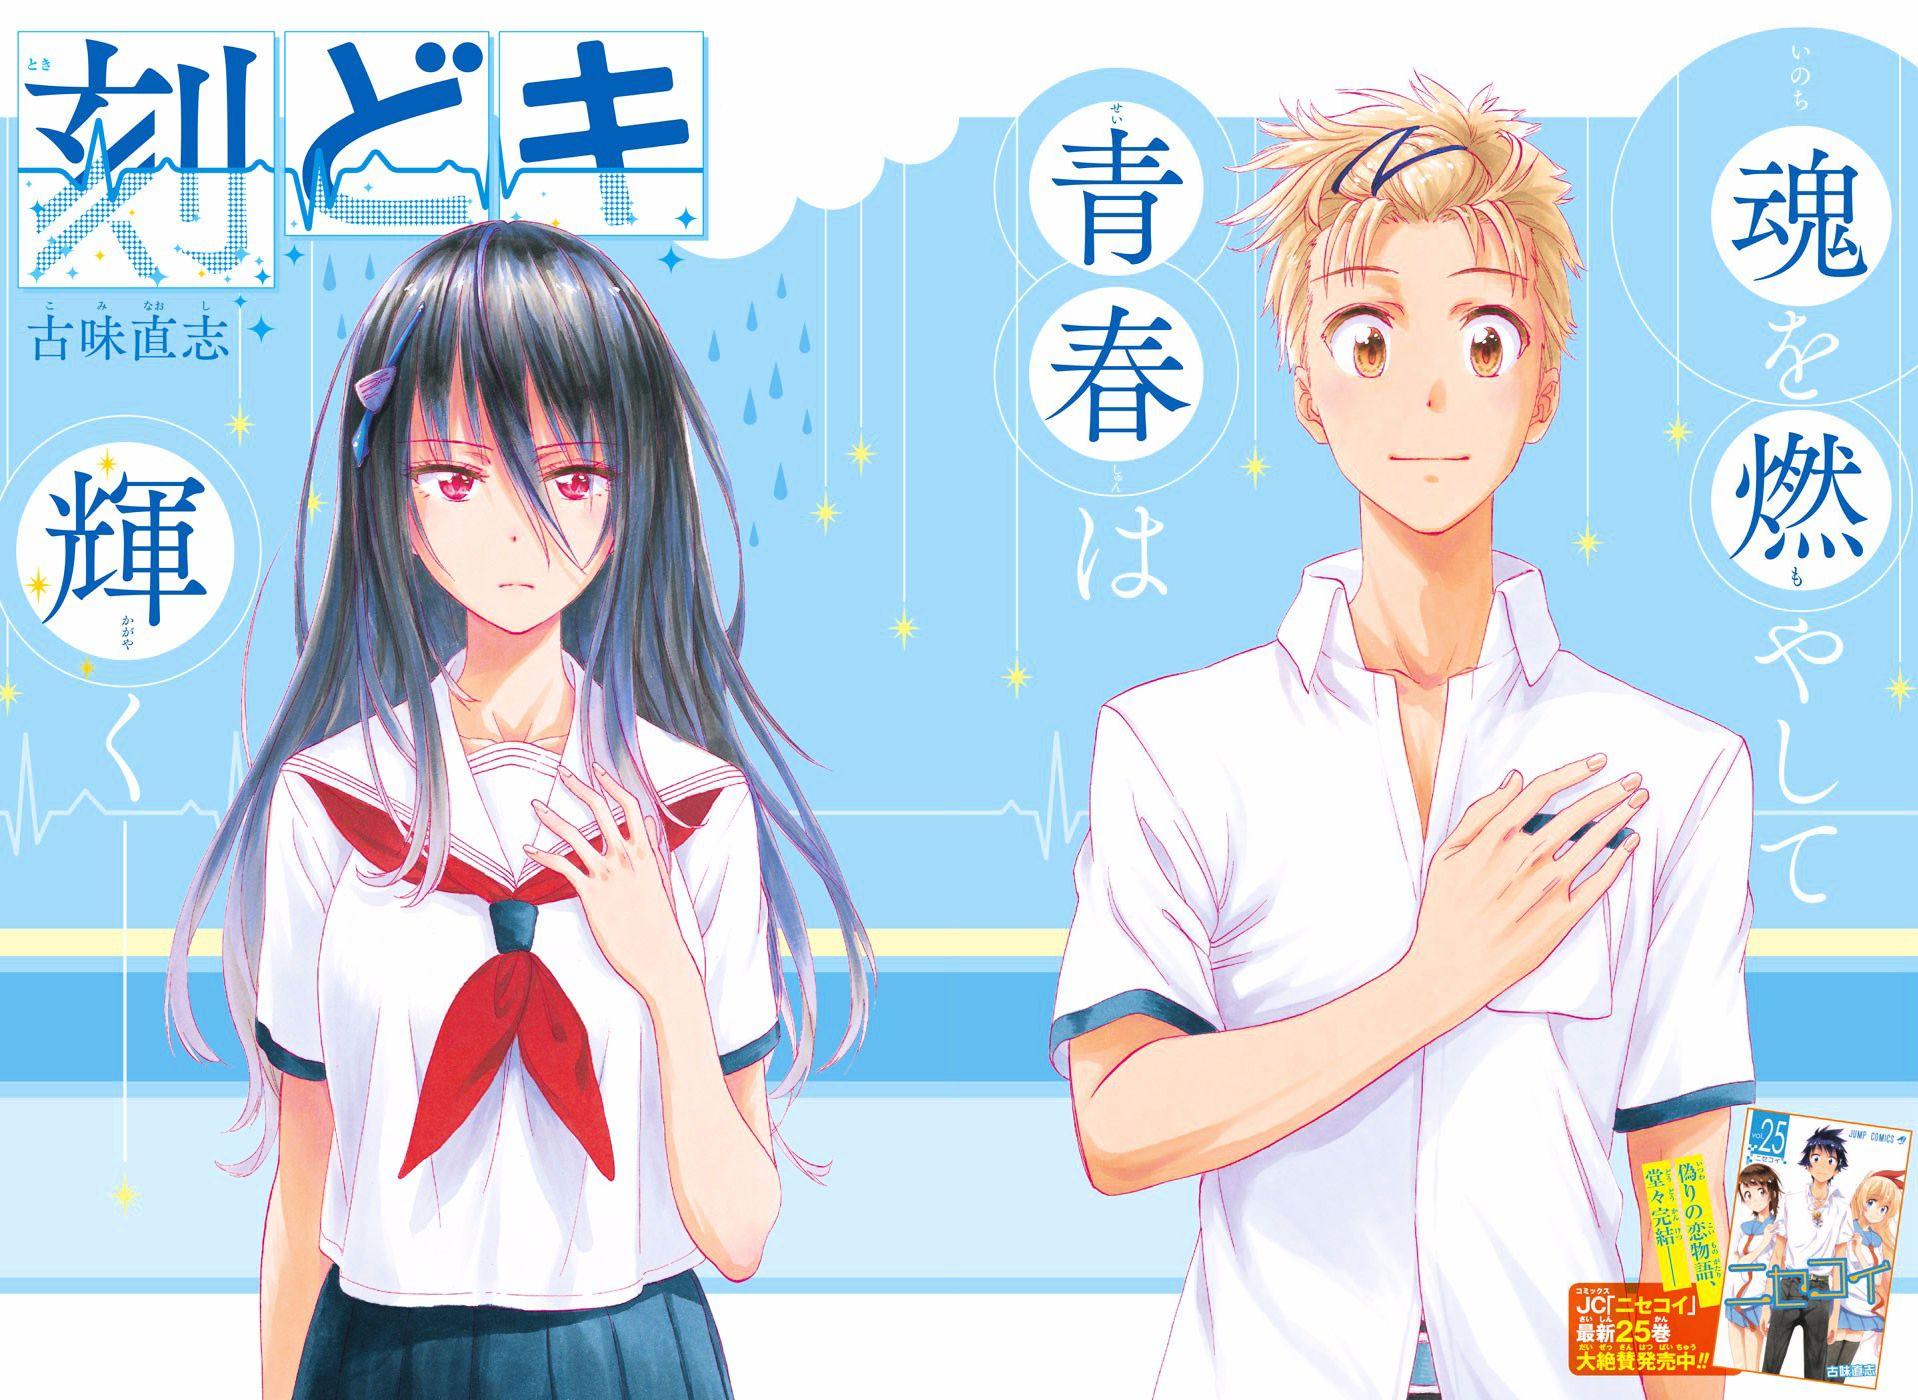 http//m.mangafox.me/manga/toki_doki/ Nisekoi, Anime